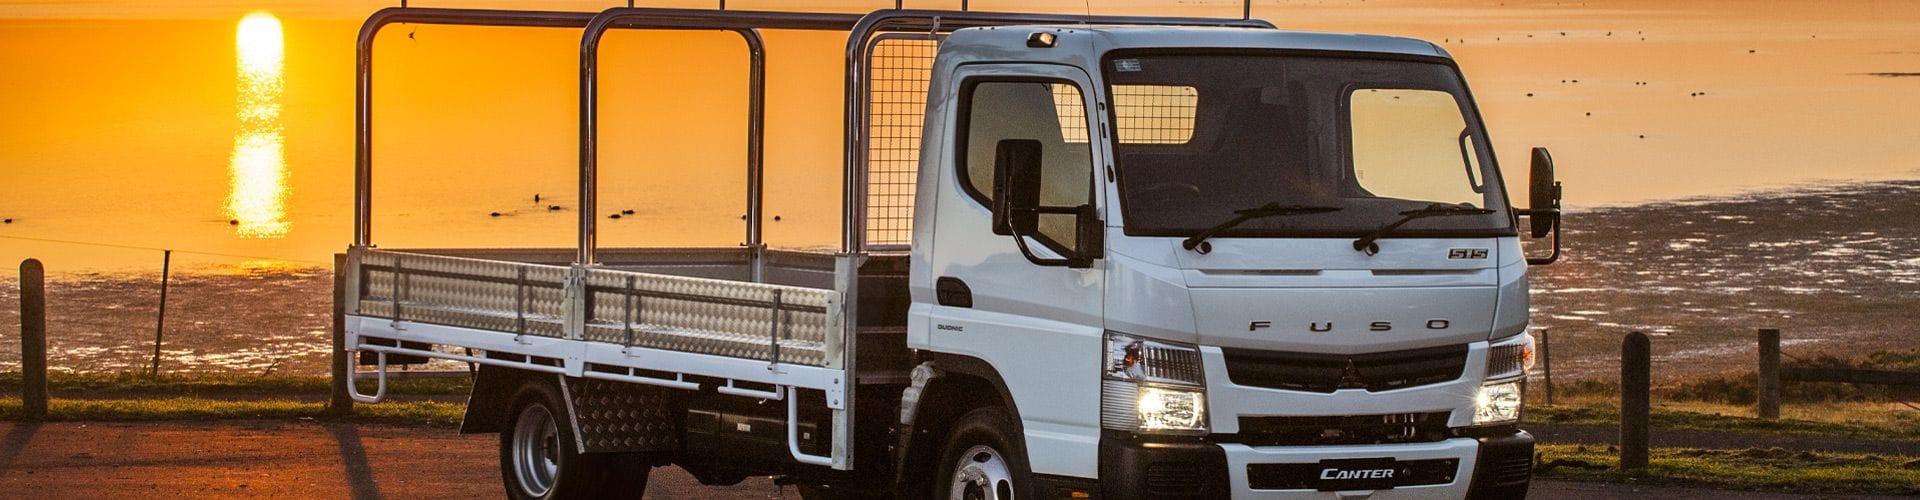 FUSO Canter | Daimler Trucks Wagga & Albury